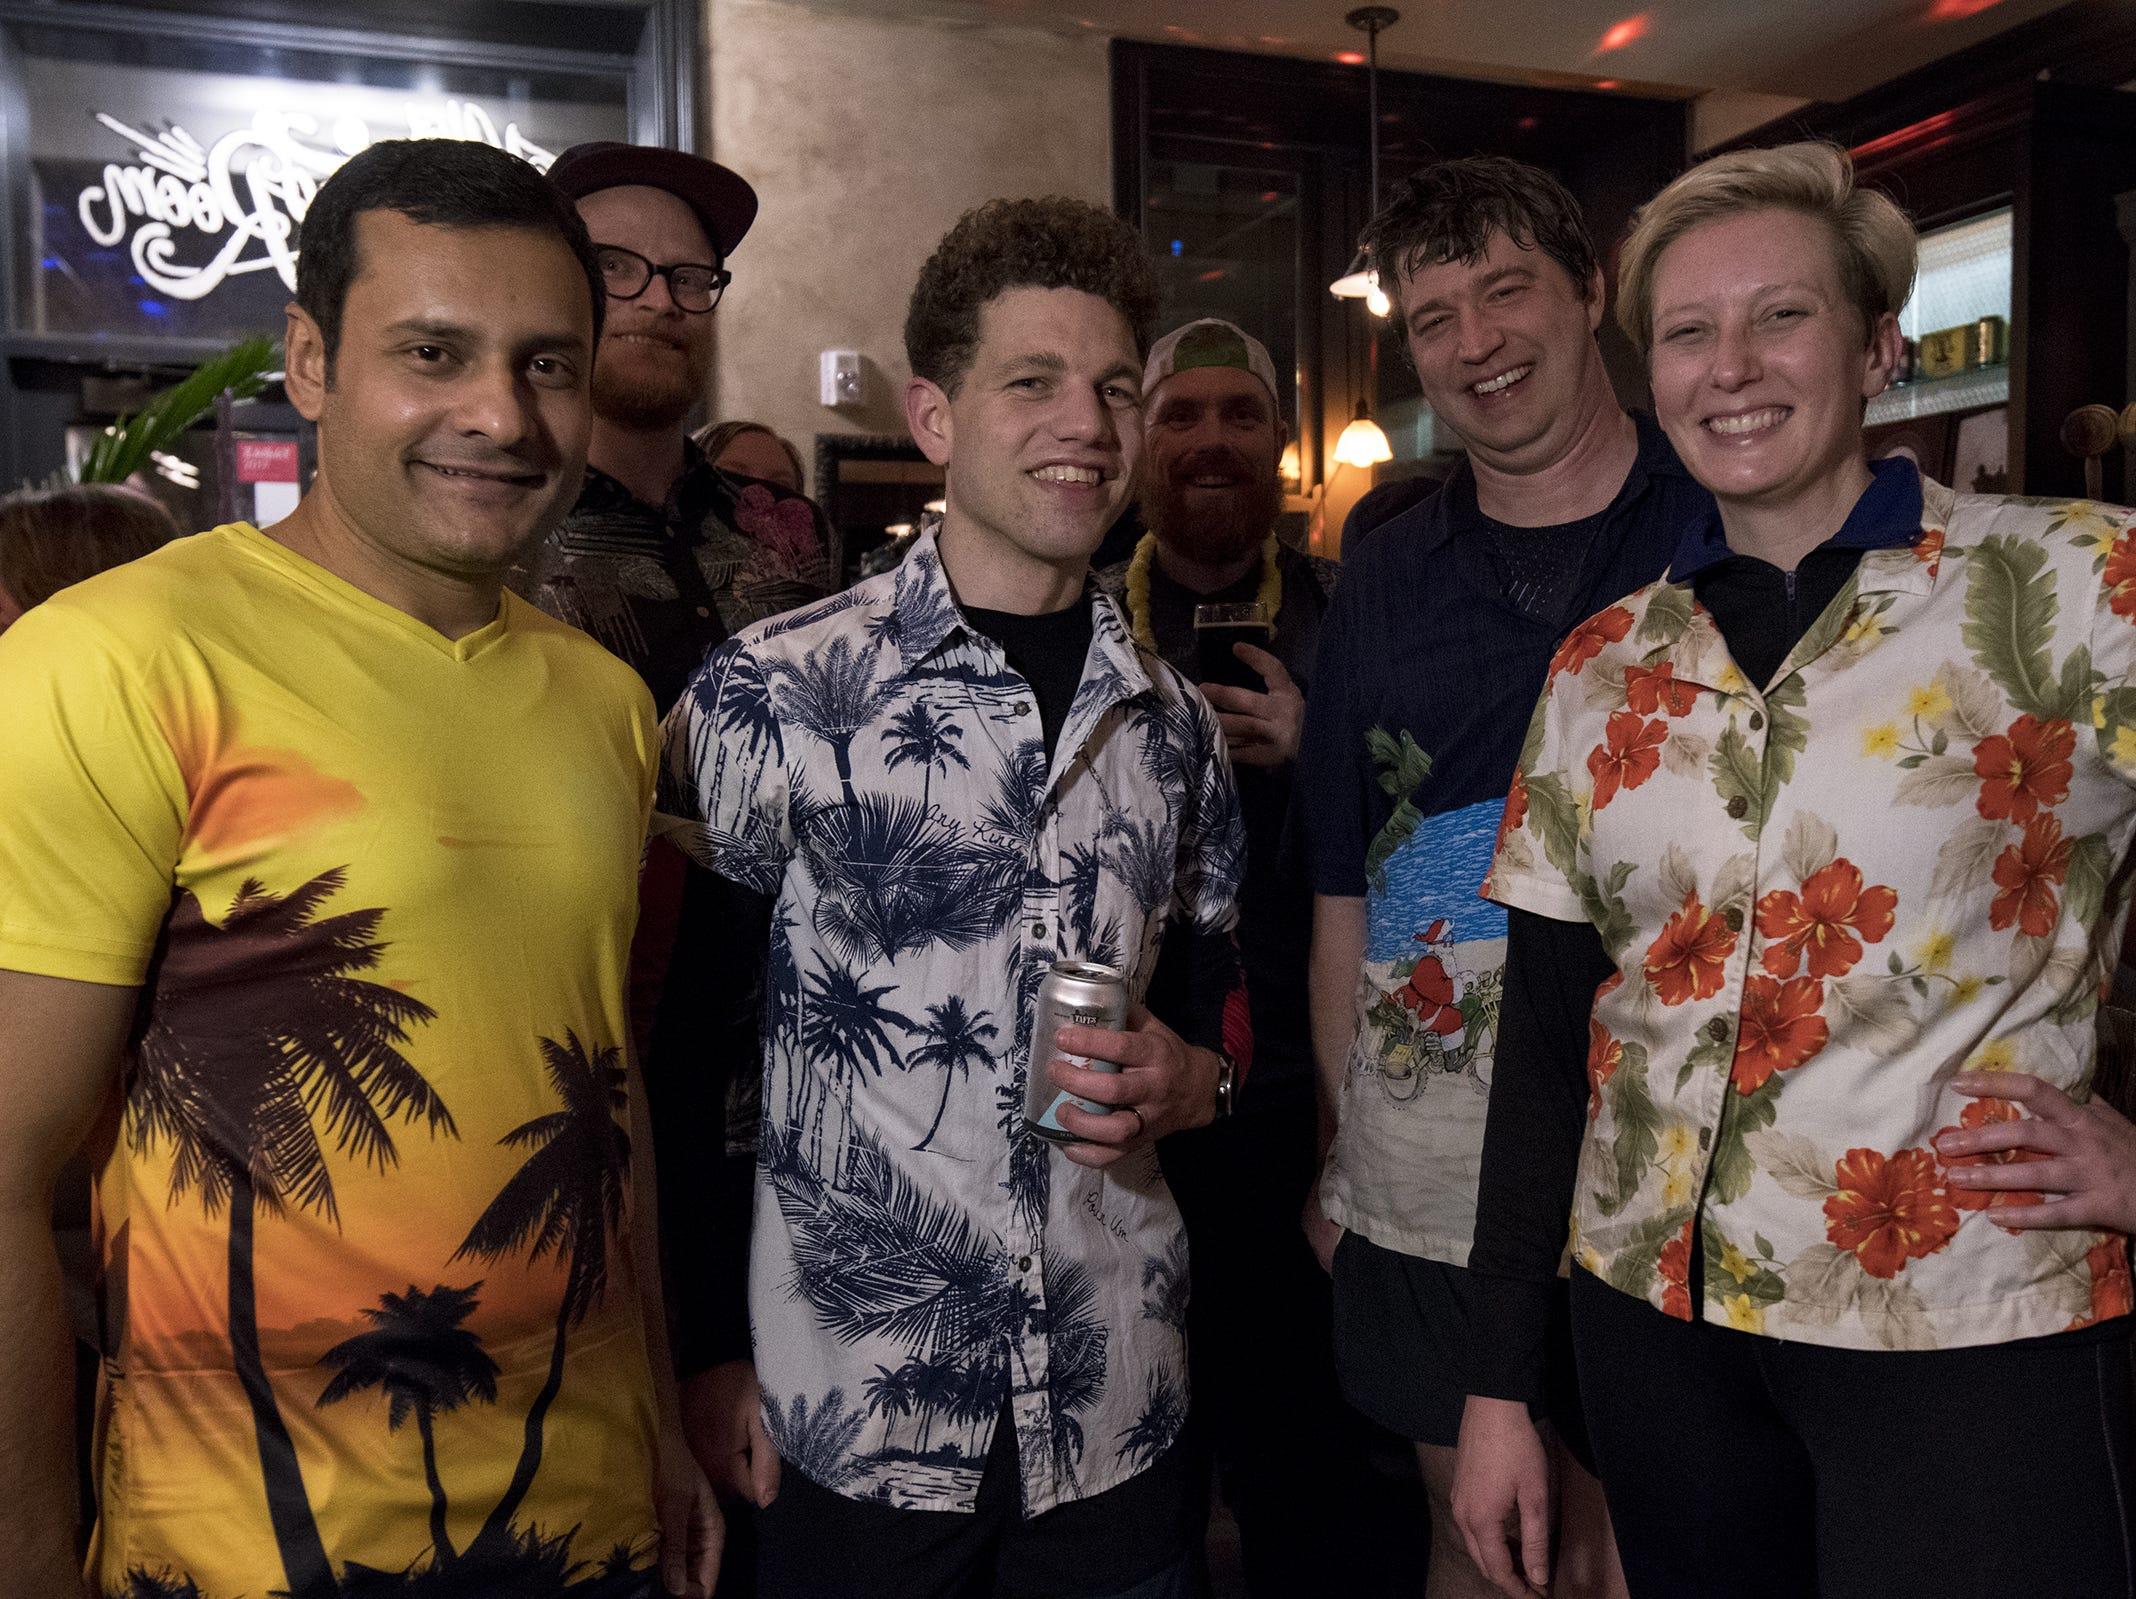 Taft Running Club members Shaahid Noor, Stephen Abt, Paul Staudigel, Mitch Morrison and Lindsey Cencula don Hawaiian shirts for Beach Night at Taft's Ale House January 17, 2019 in Cincinnati, Ohio.